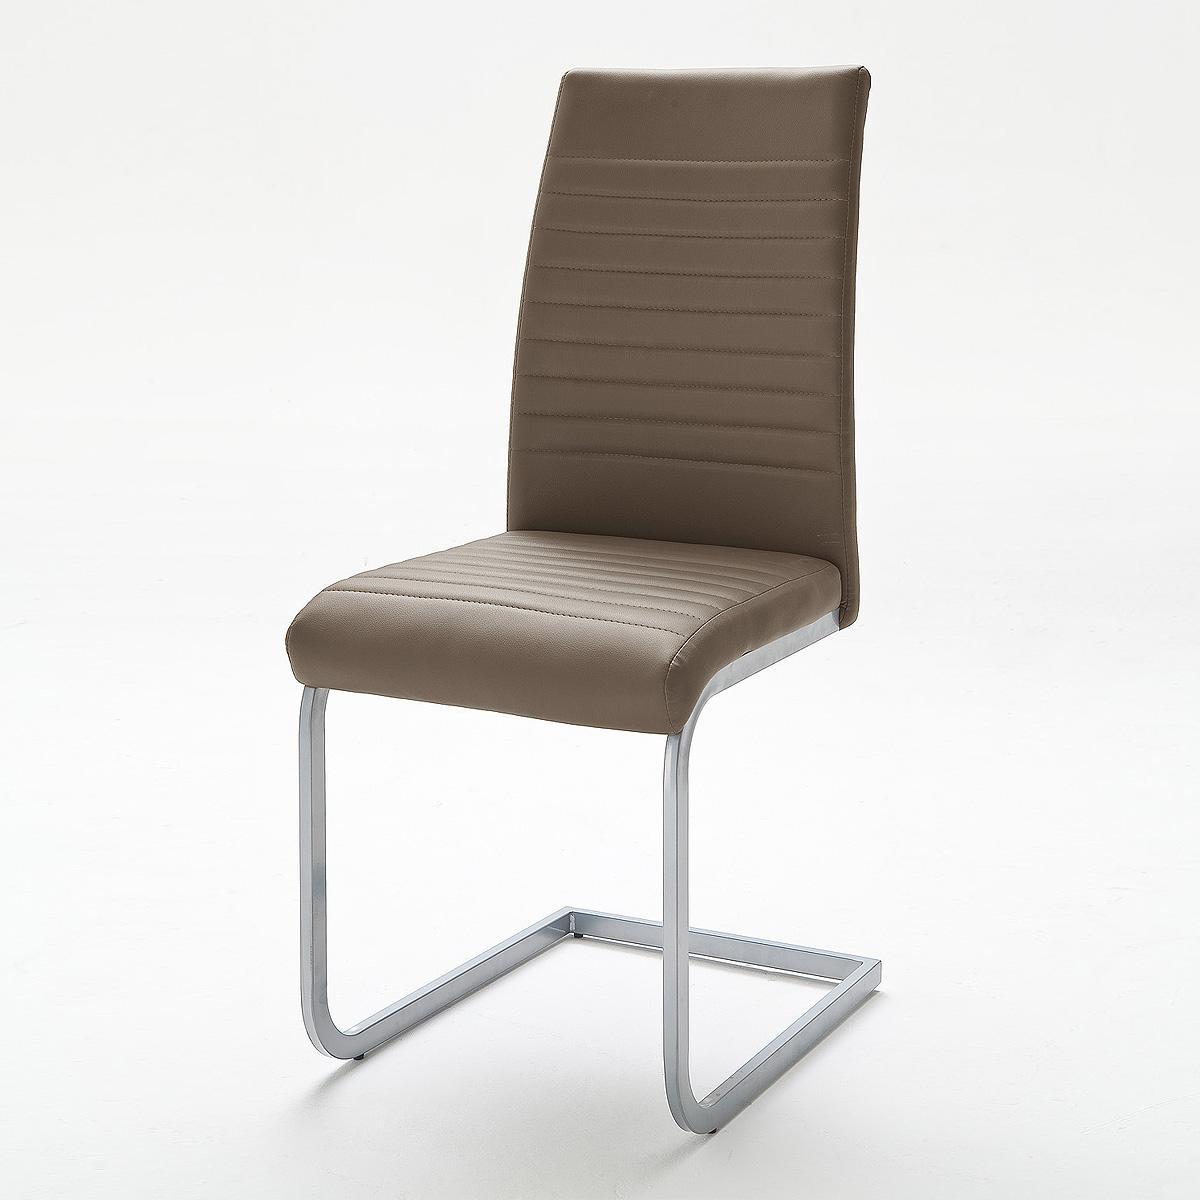 schwingstuhl 4er set edna stuhl in braun cappuccino grau. Black Bedroom Furniture Sets. Home Design Ideas